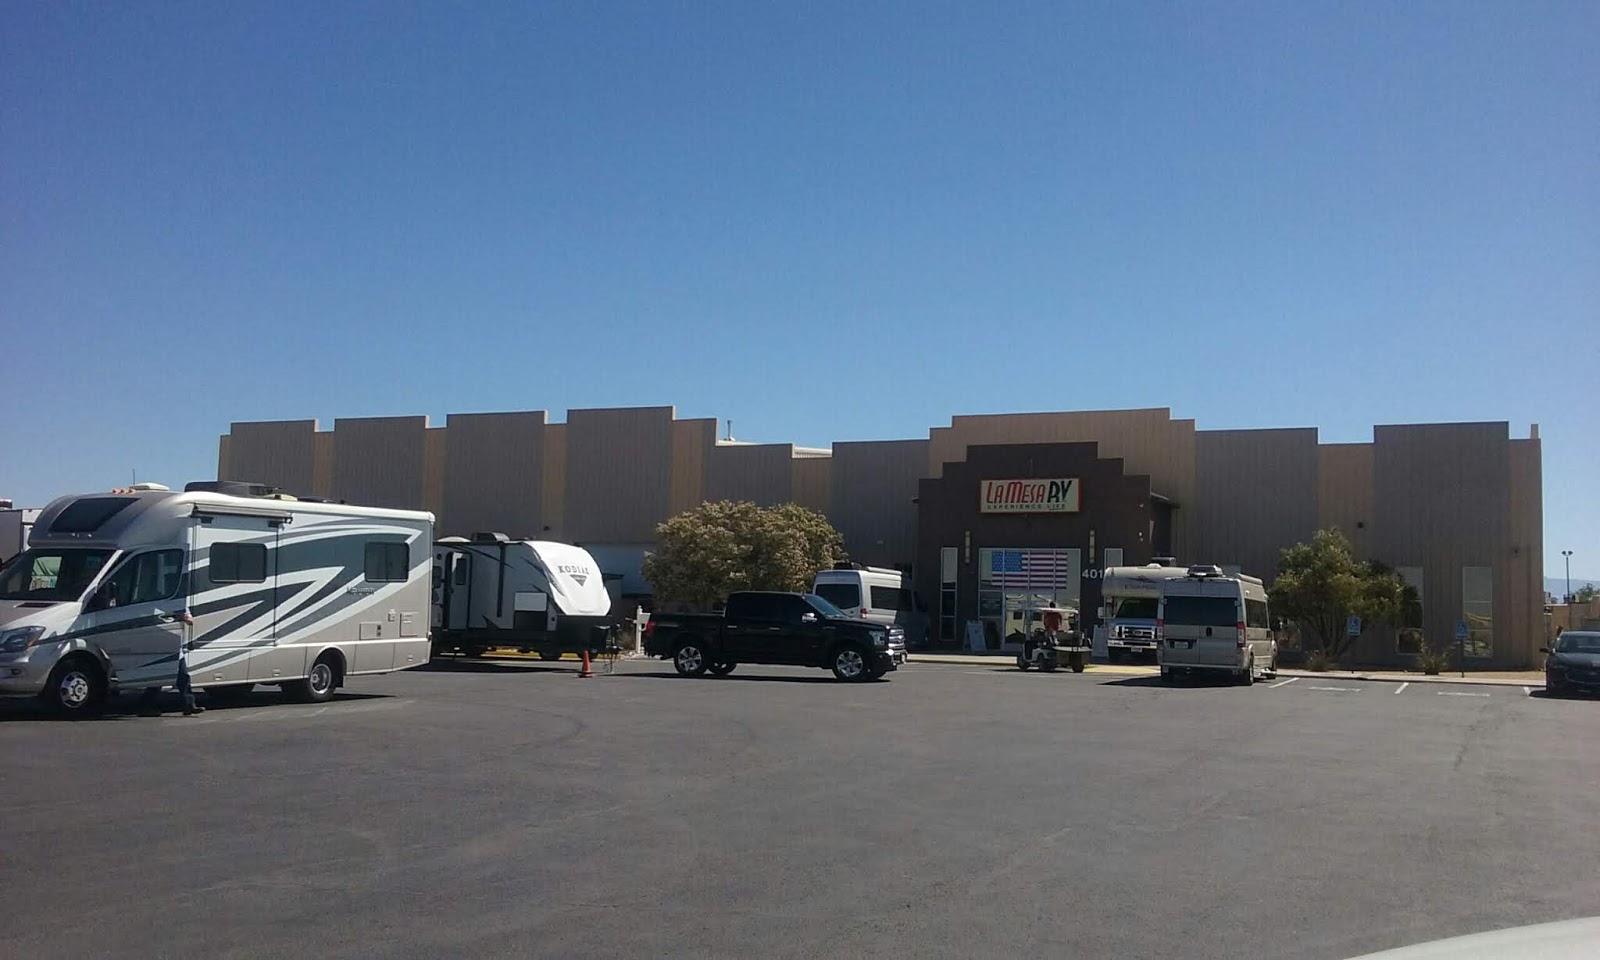 Armand S Rancho Del Cielo Albuquerque La Mesa Rv And